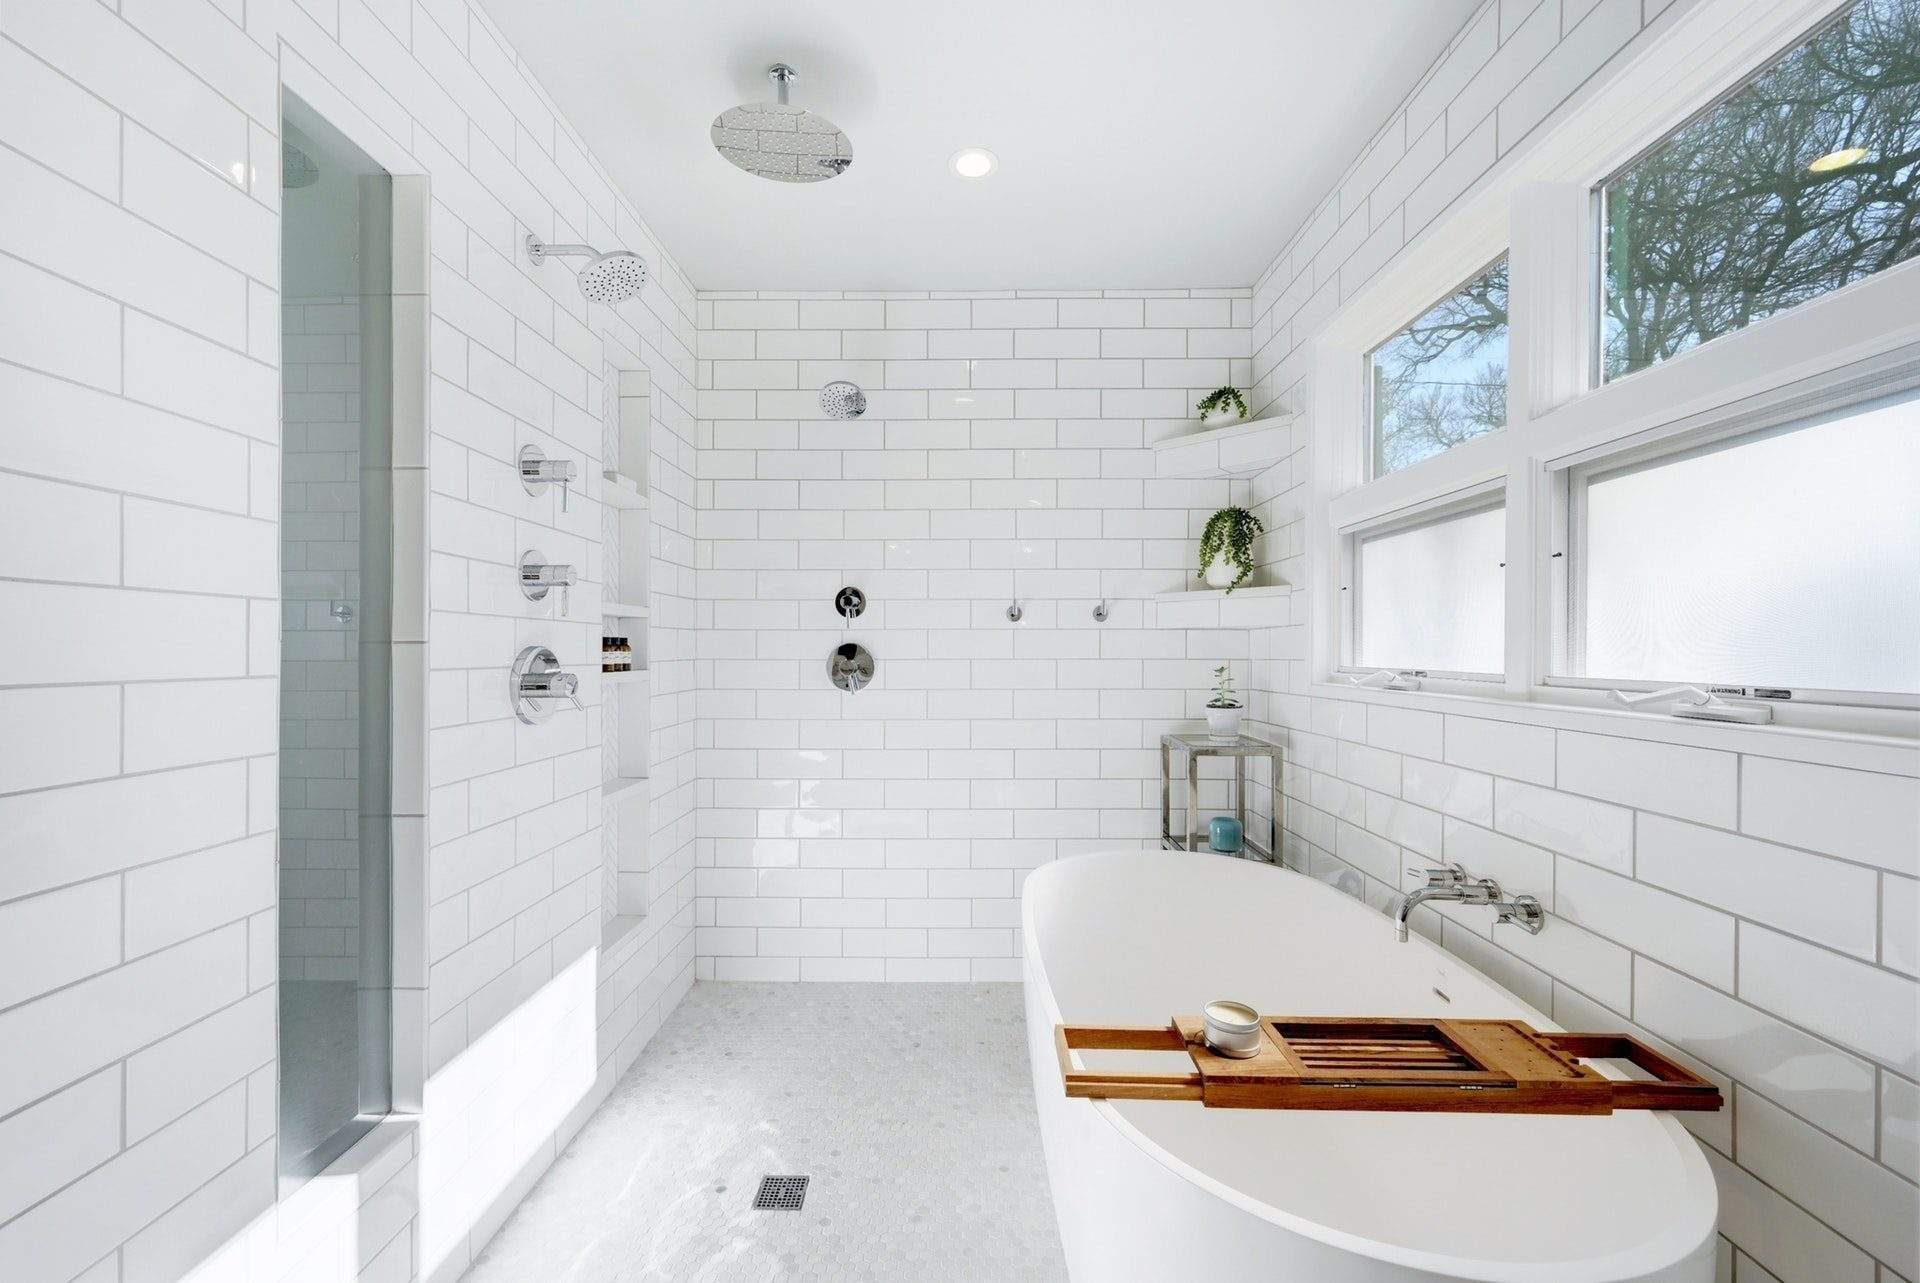 Allandale - interior design Austin | shower with shelves, tub, and windows | autstin, texas